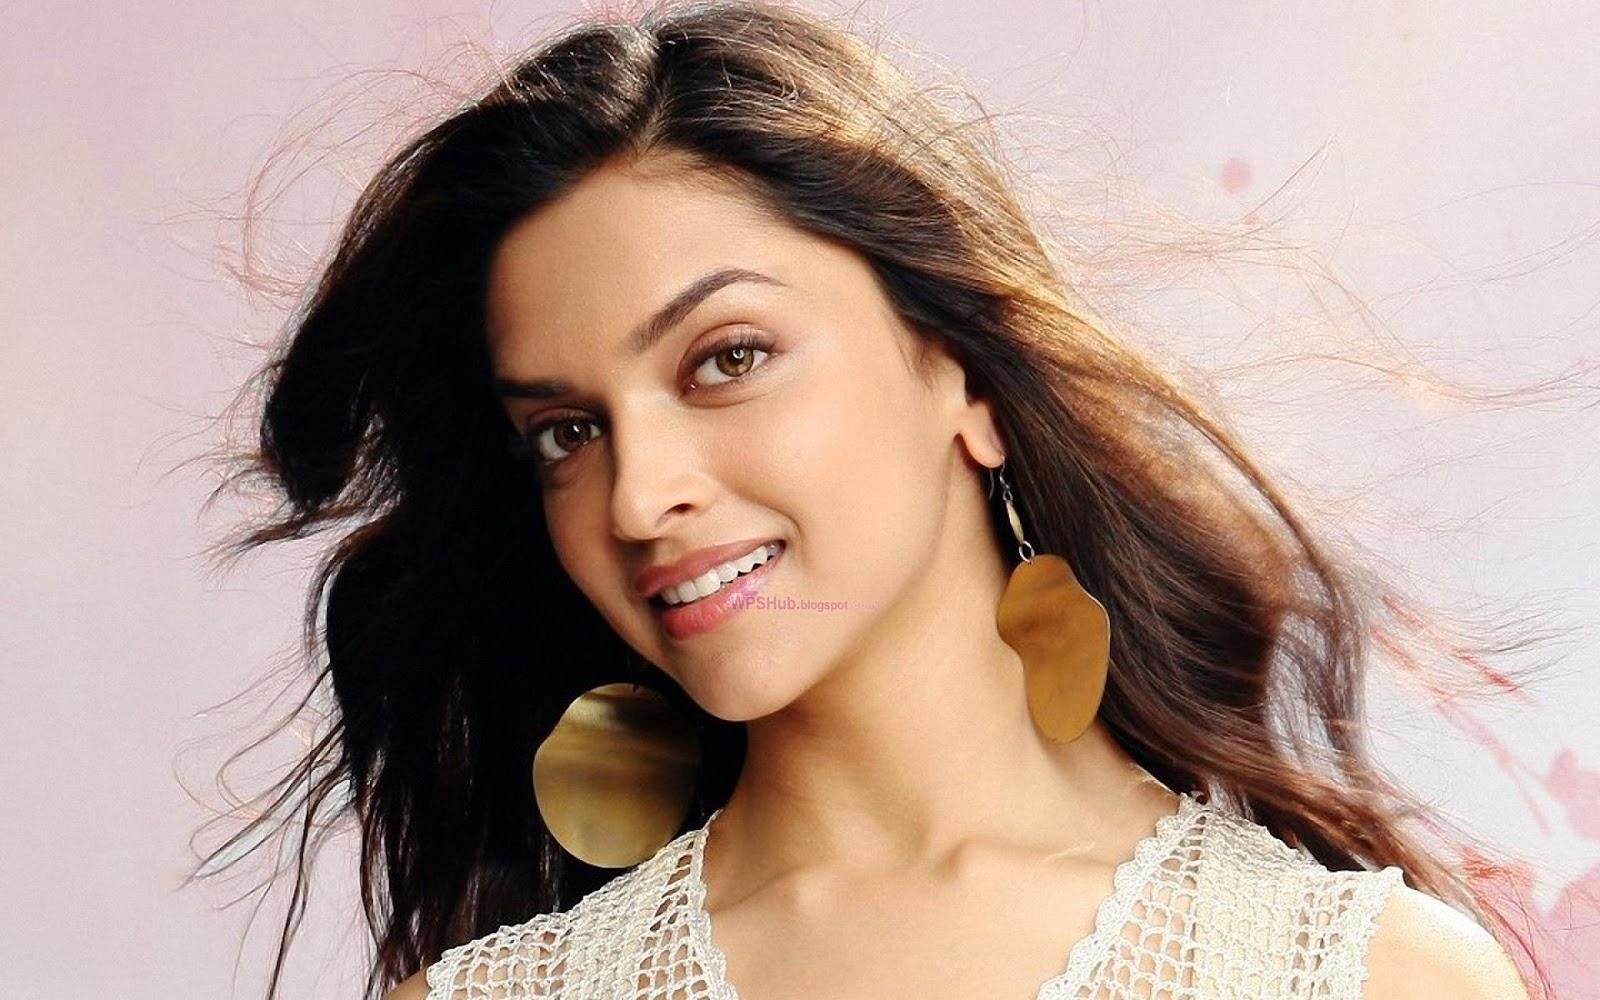 wallpapersbuzz: beautiful indian girl wallpapers hd